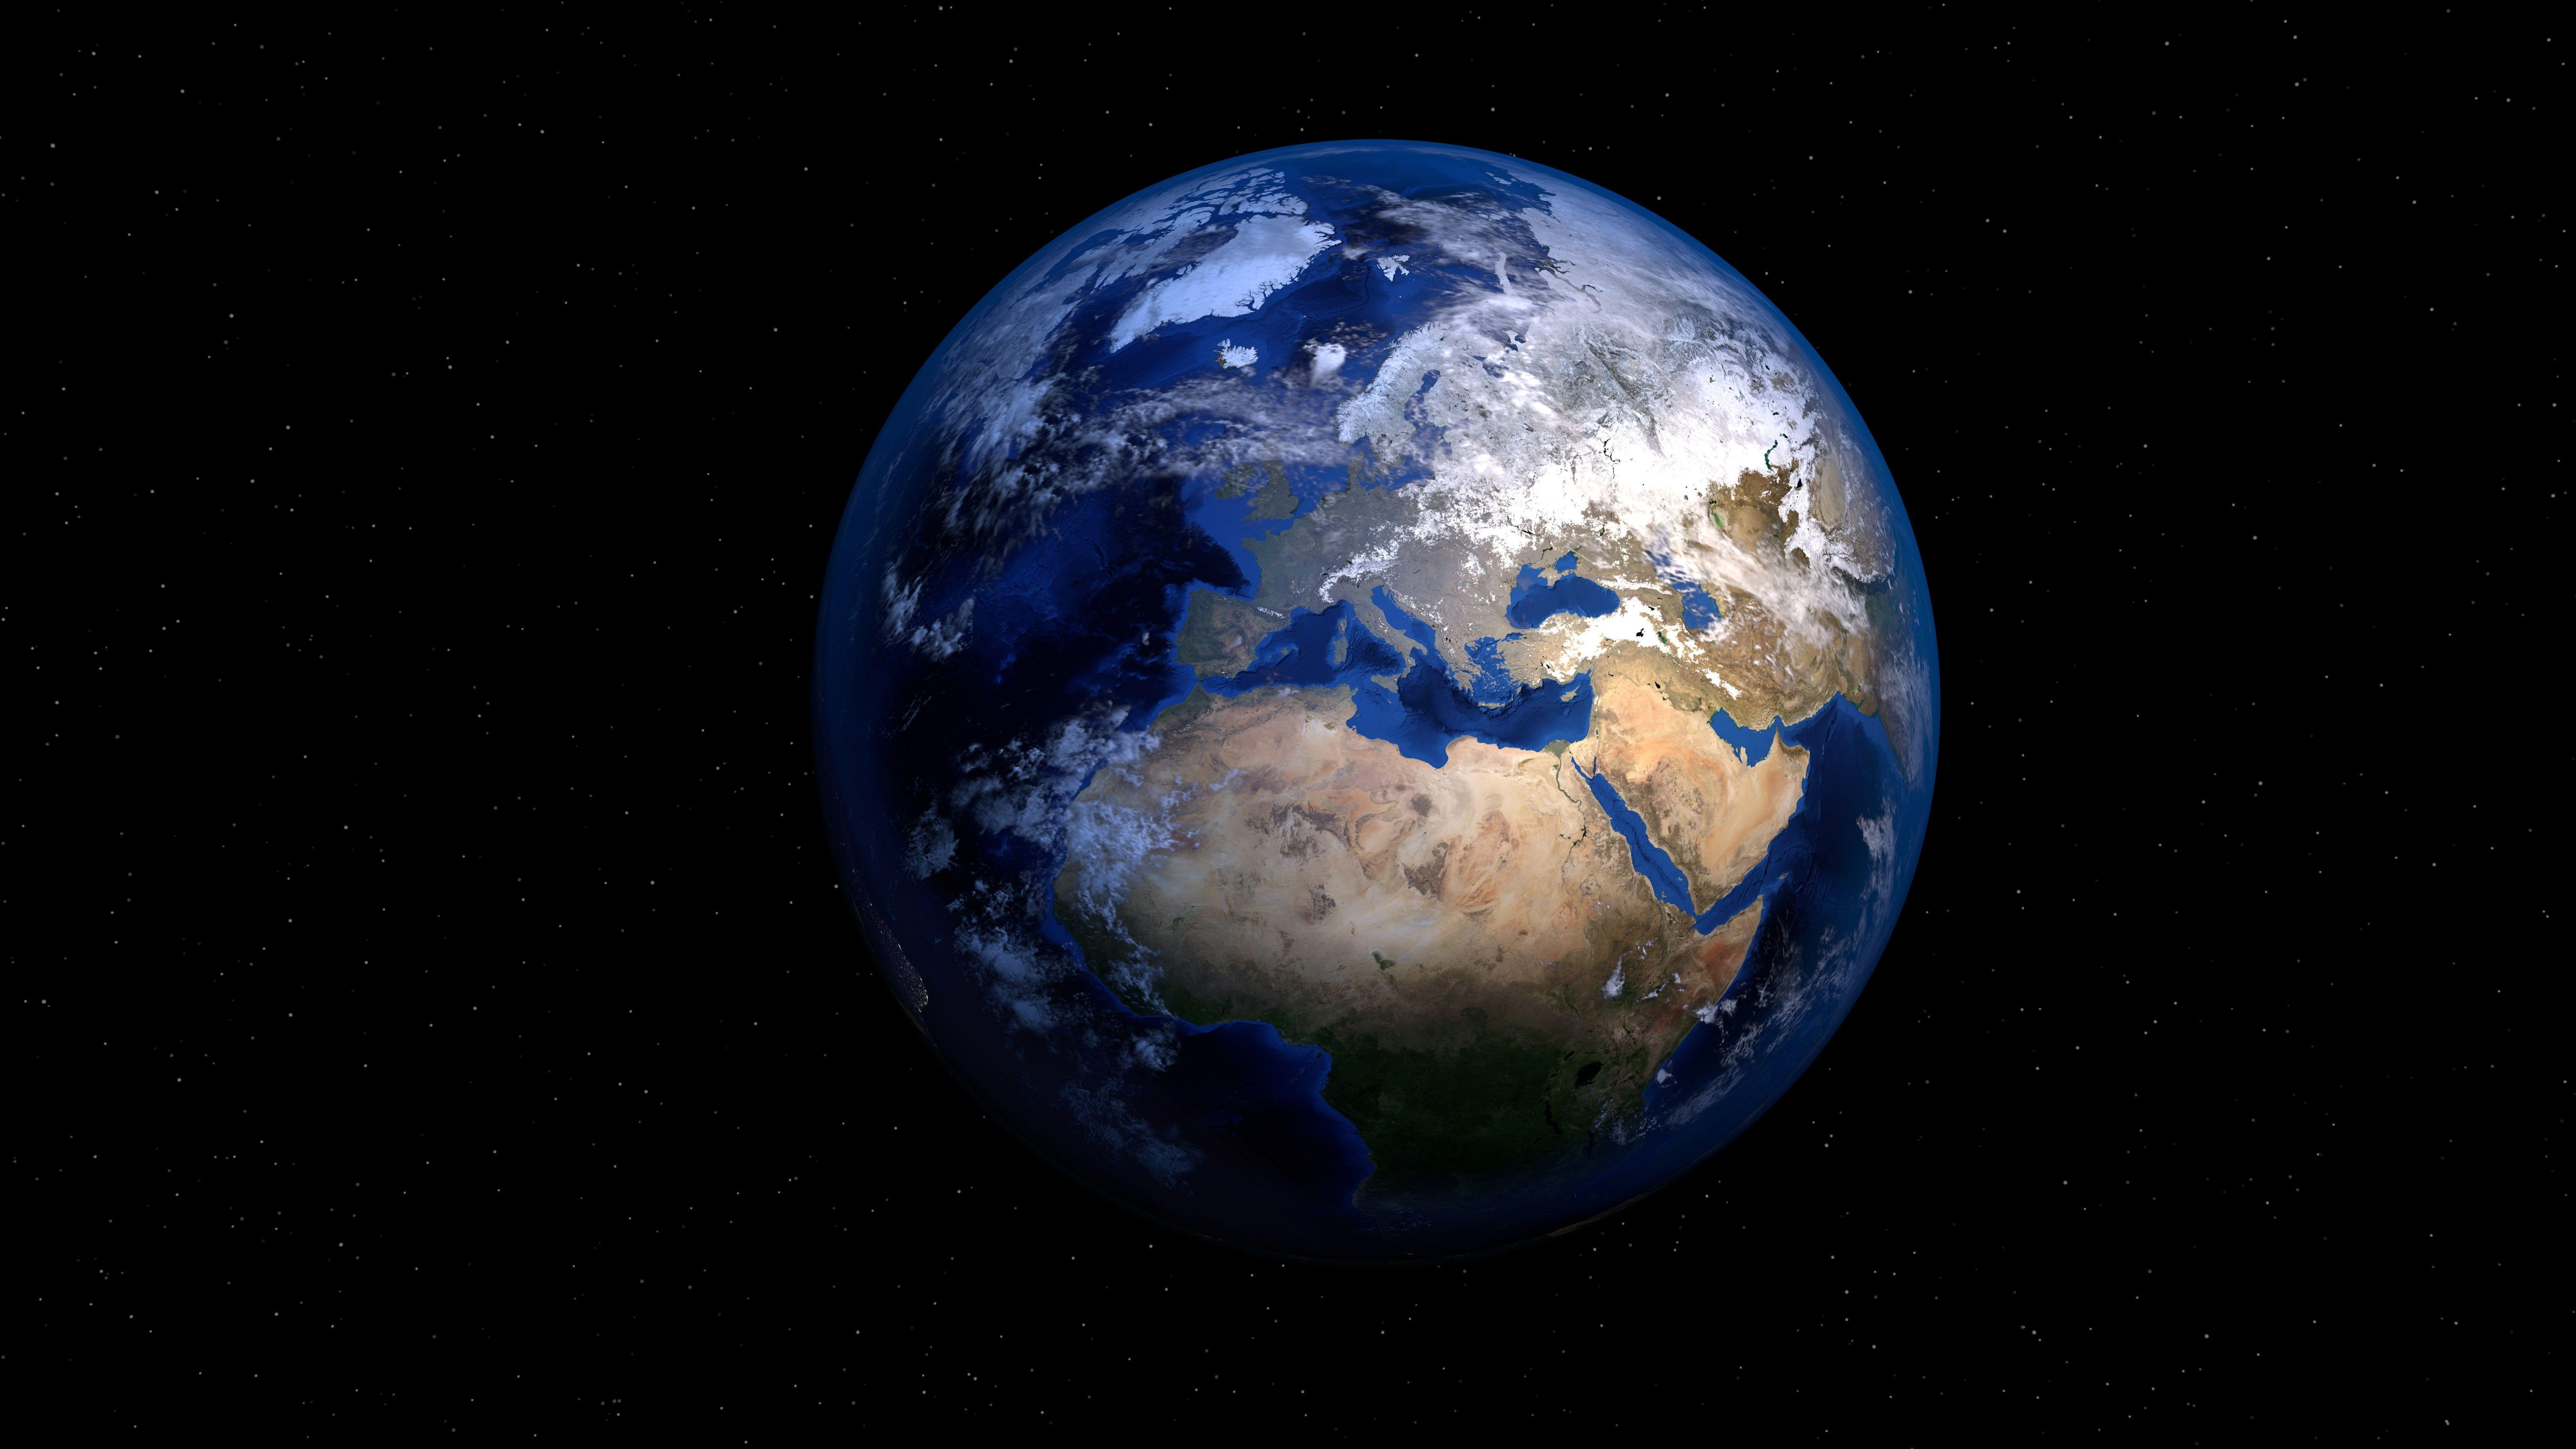 Blue Globe 5k Earth Dark Background World Planet 5k Wallpaper Hdwallpaper Desktop Planets Earth Earth Day Quotes